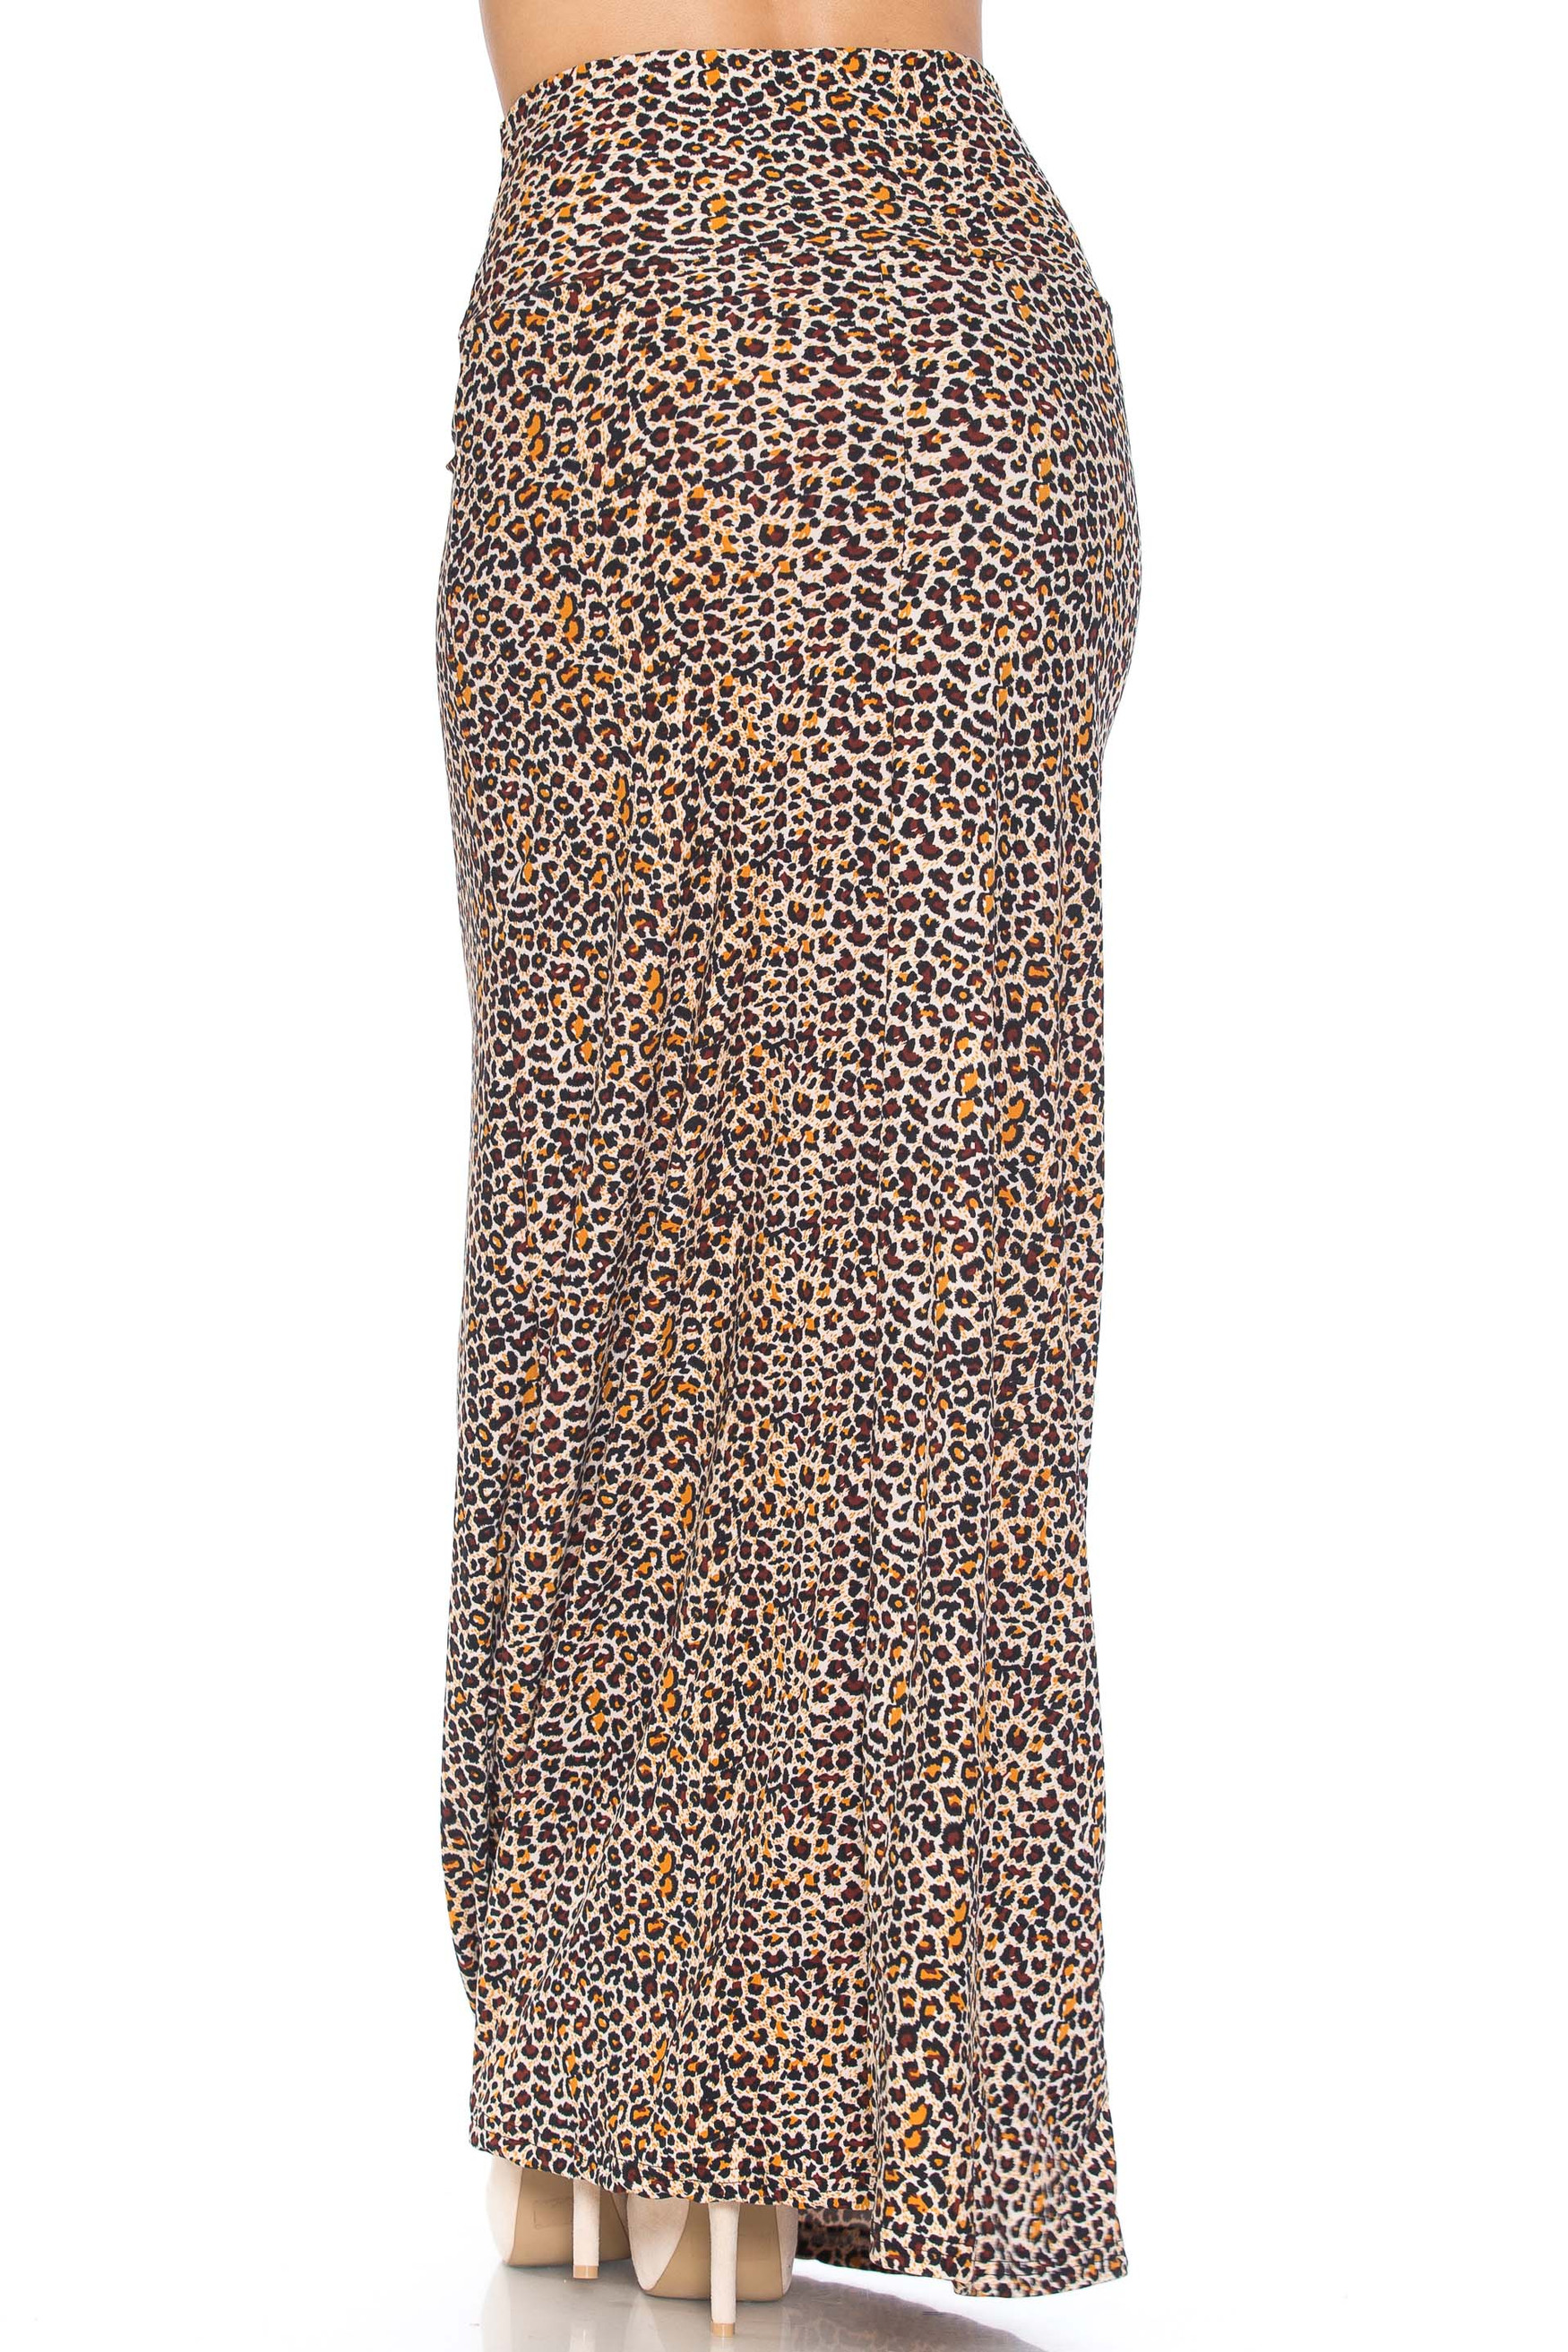 Savage Leopard Buttery Soft Maxi Skirt